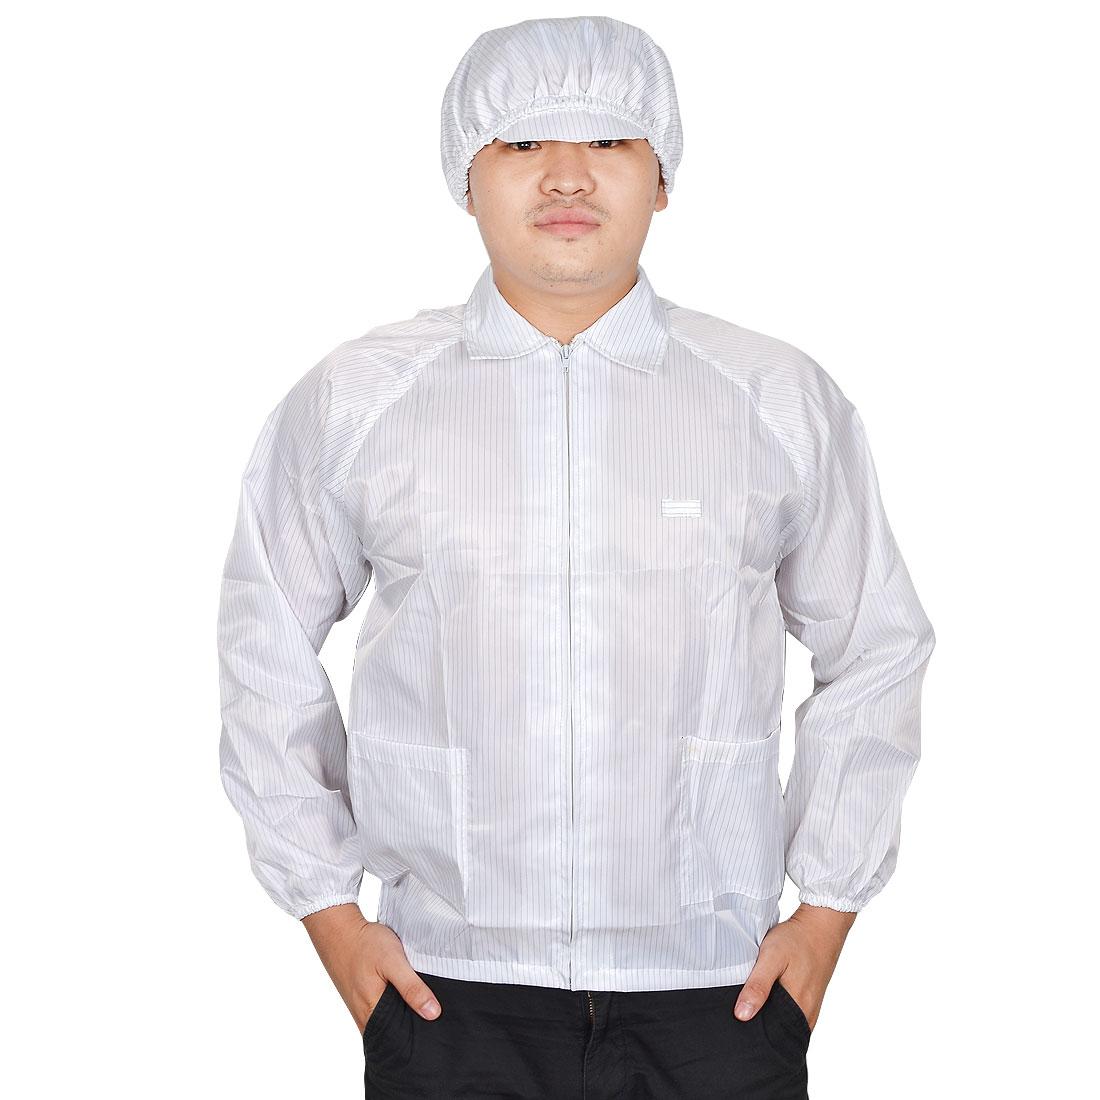 Unisex White Zipper Closure Anti Static Clean Room ESD Jacket Uniform w Cap L